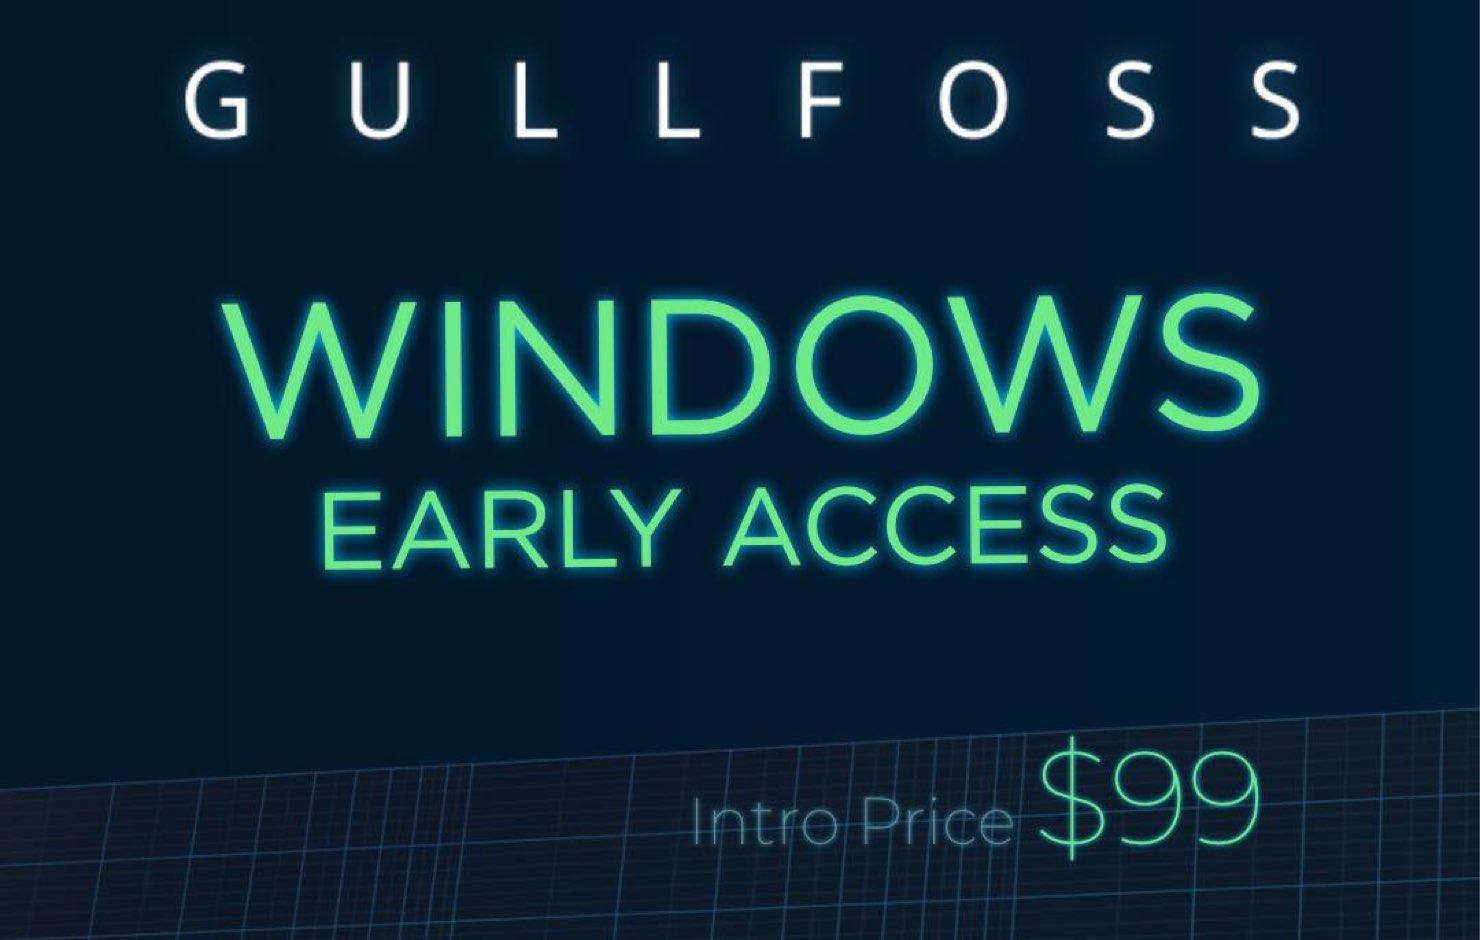 【50%OFF】Soundtheory「Gullfoss」Windows版イントロセール中!iLok オーソライズ方法